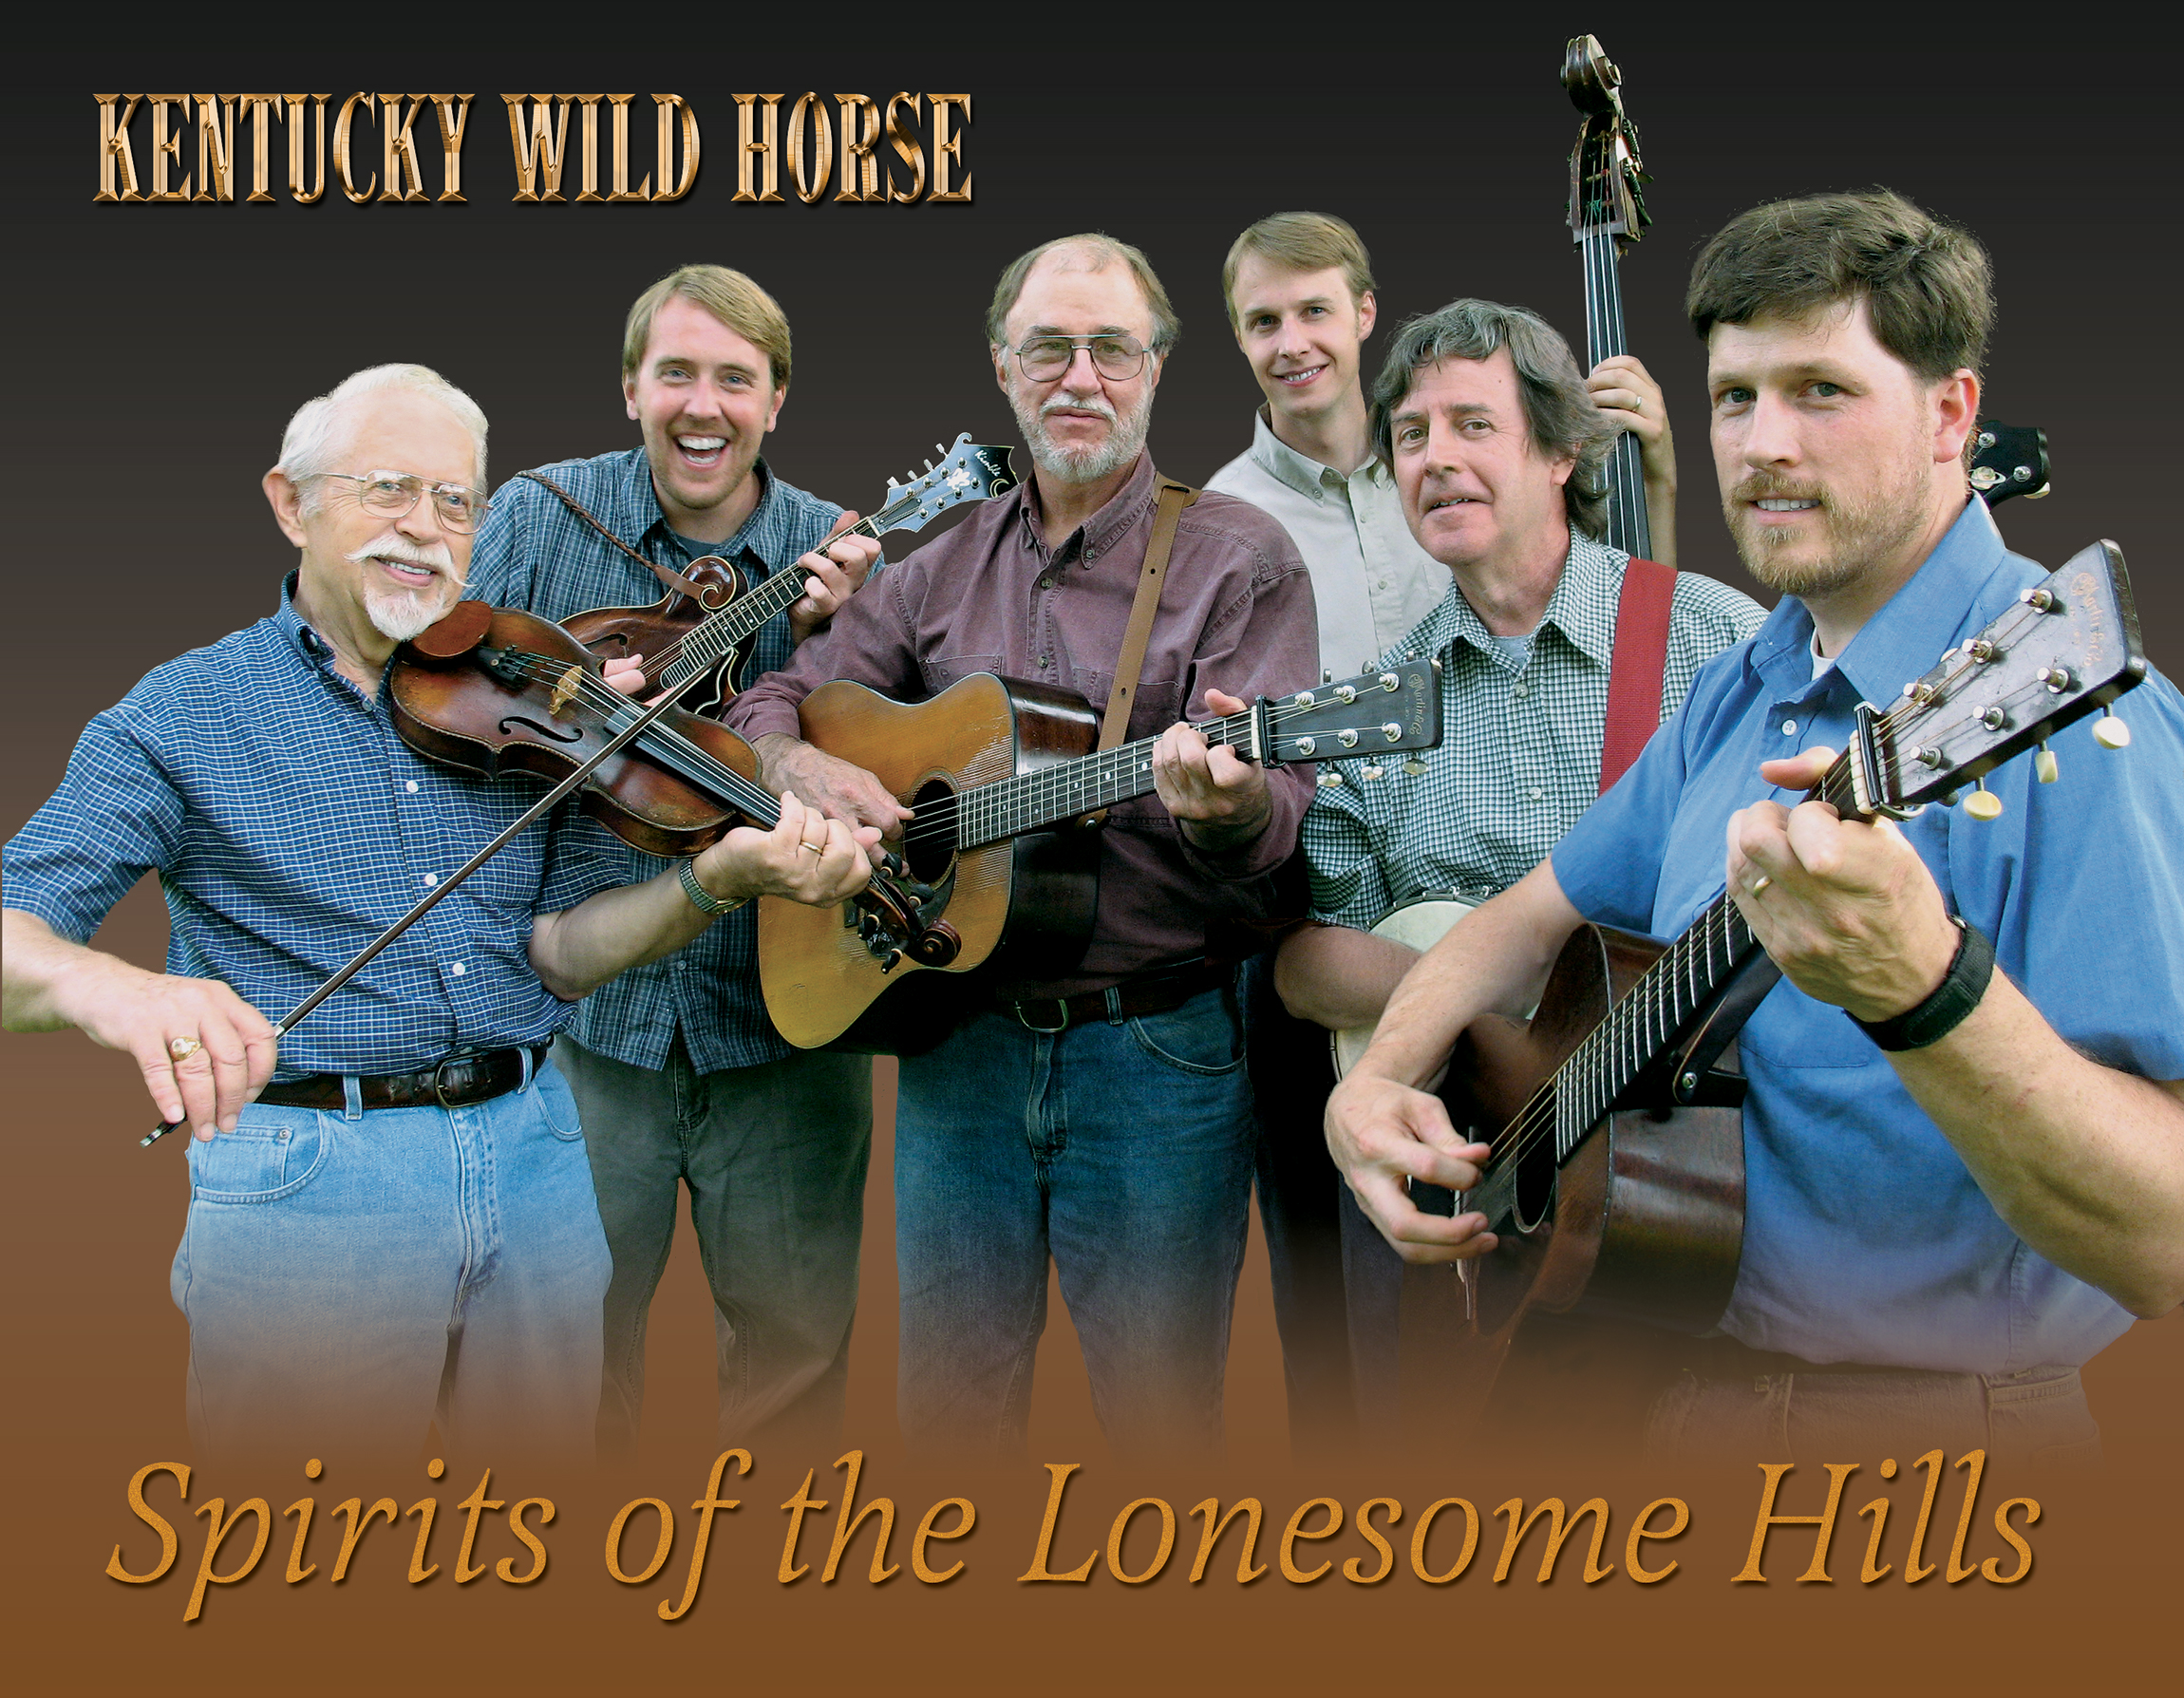 The band in 2006: Paul David Smith, Jeff Keith, John Harrod, Kevin Kehrberg, Jim Webb, Don Rogers.